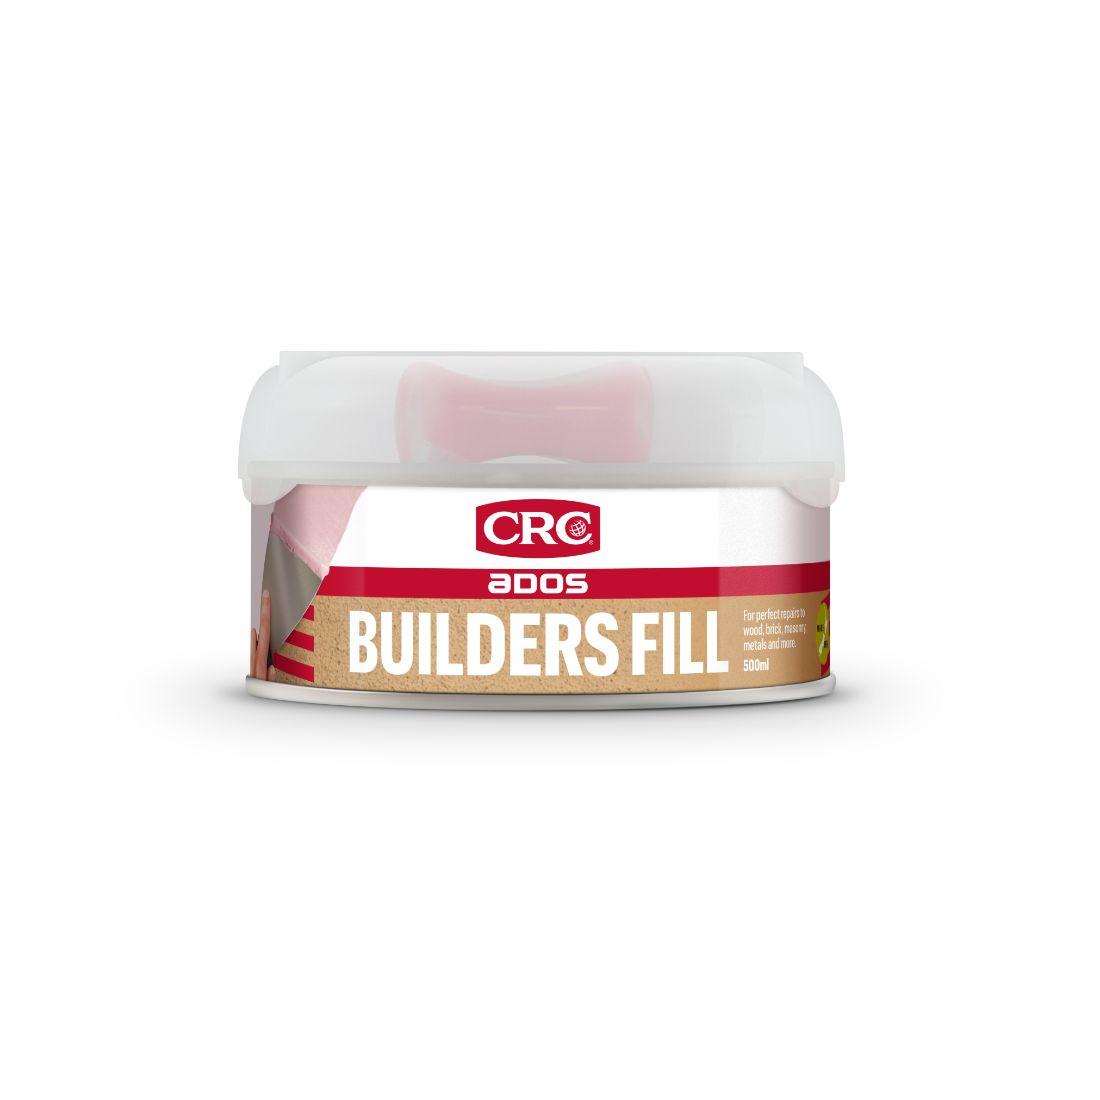 ADOS 500ml Builders Fill